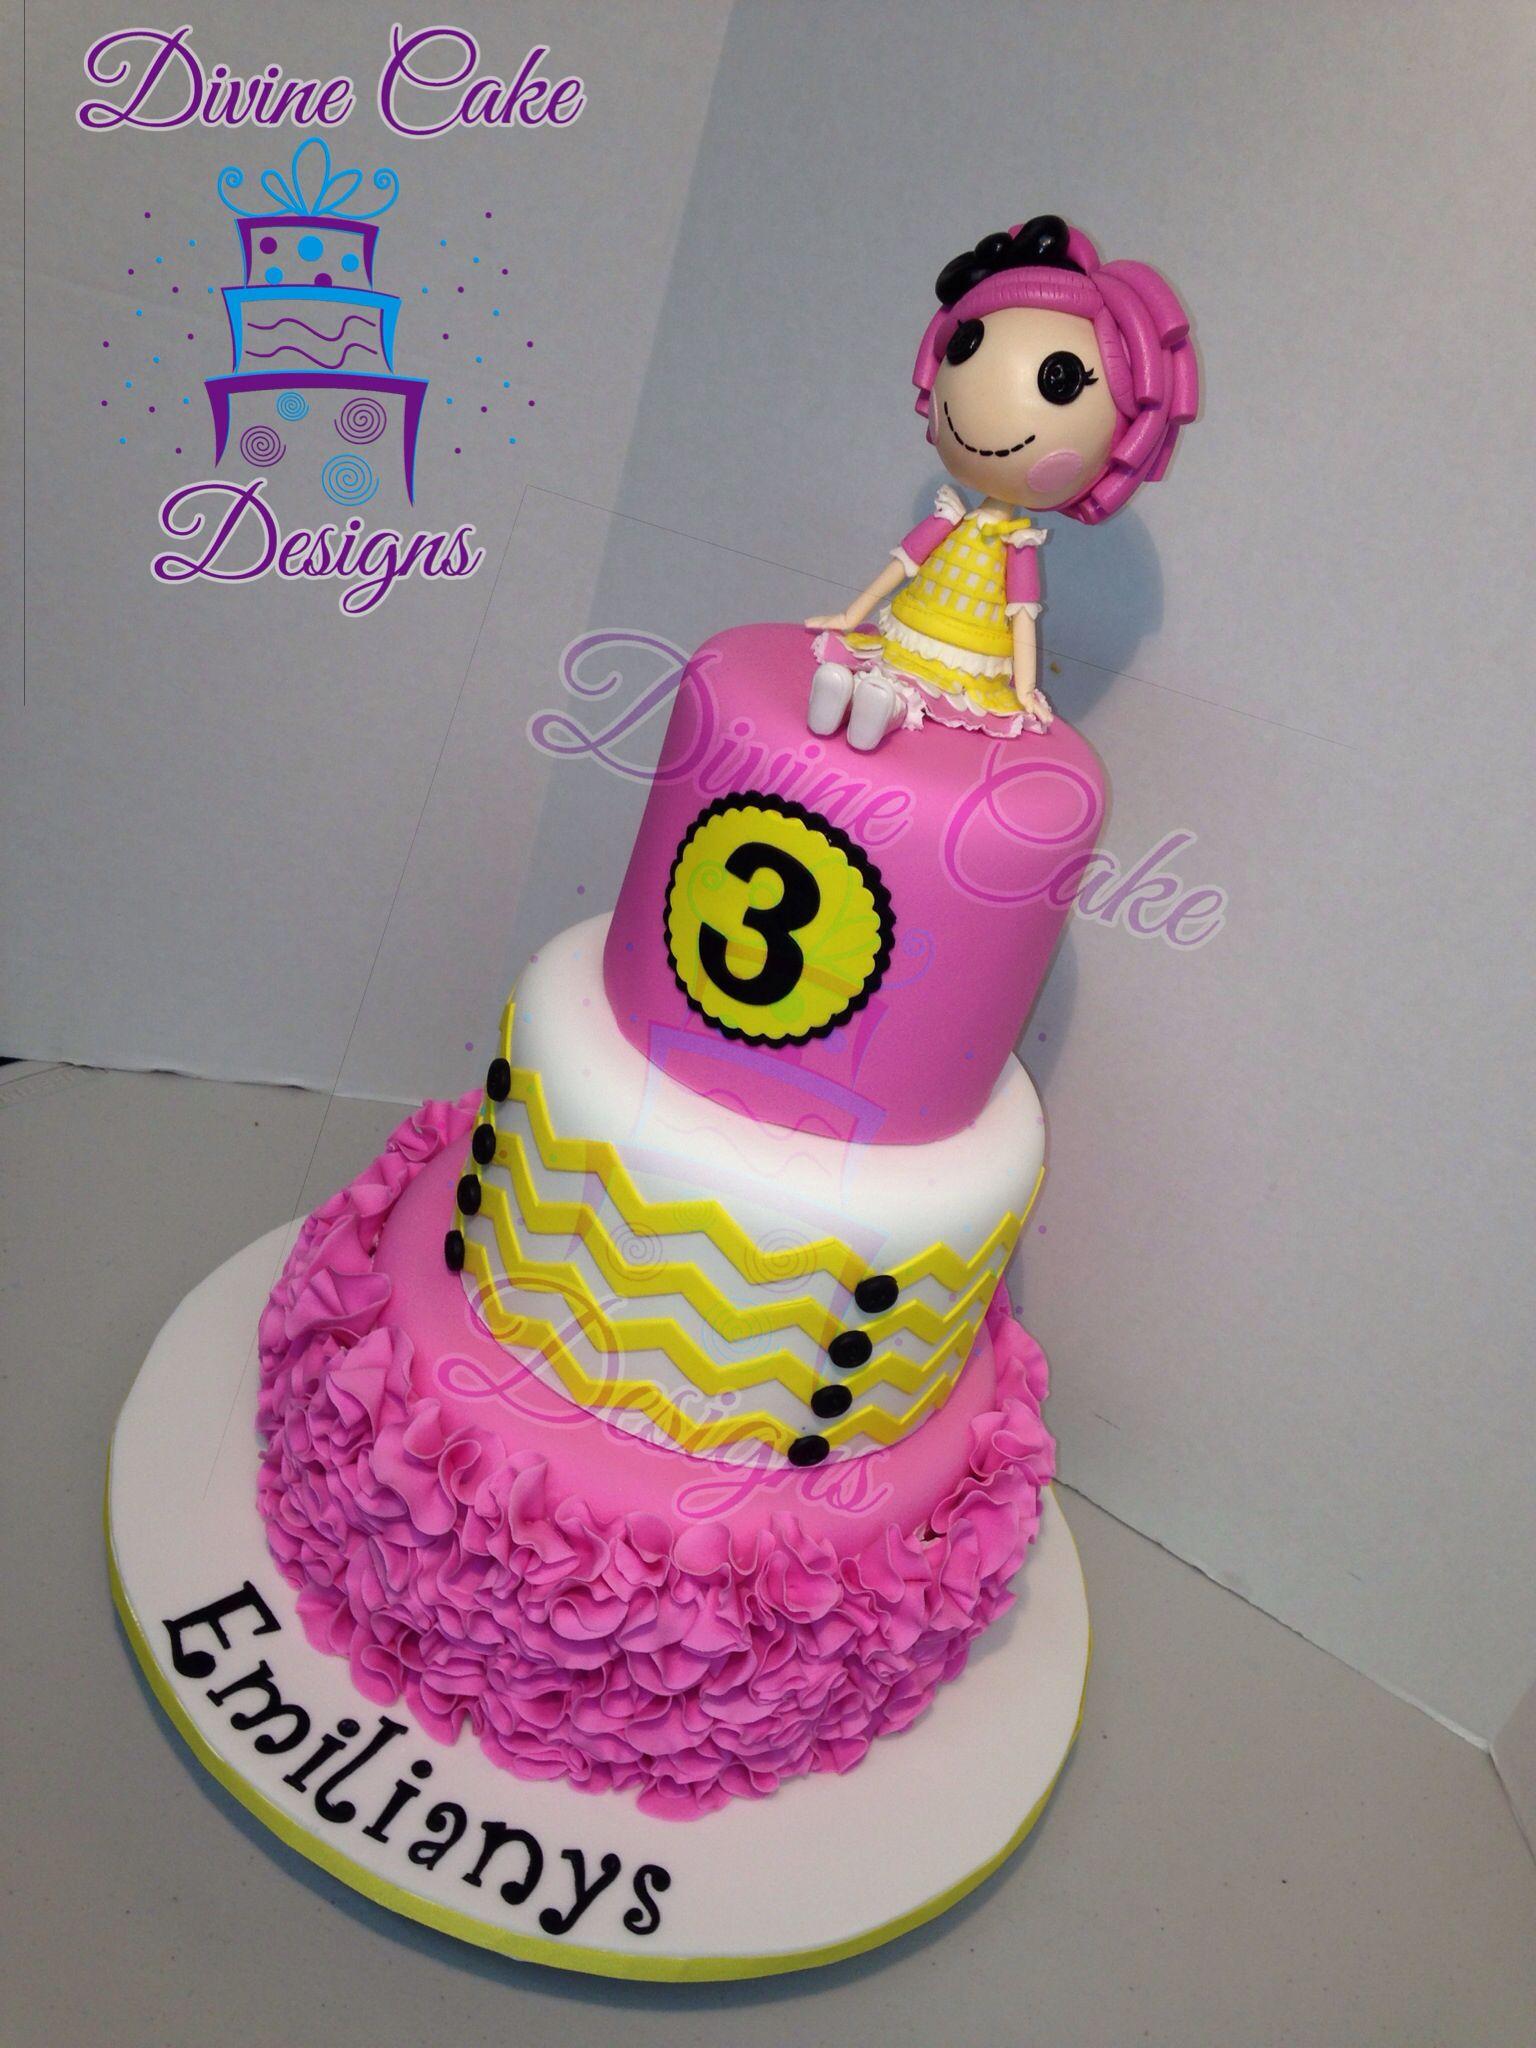 Lalaloopsy Cake With Images Birthday Cake Kids Cake Designs Cake